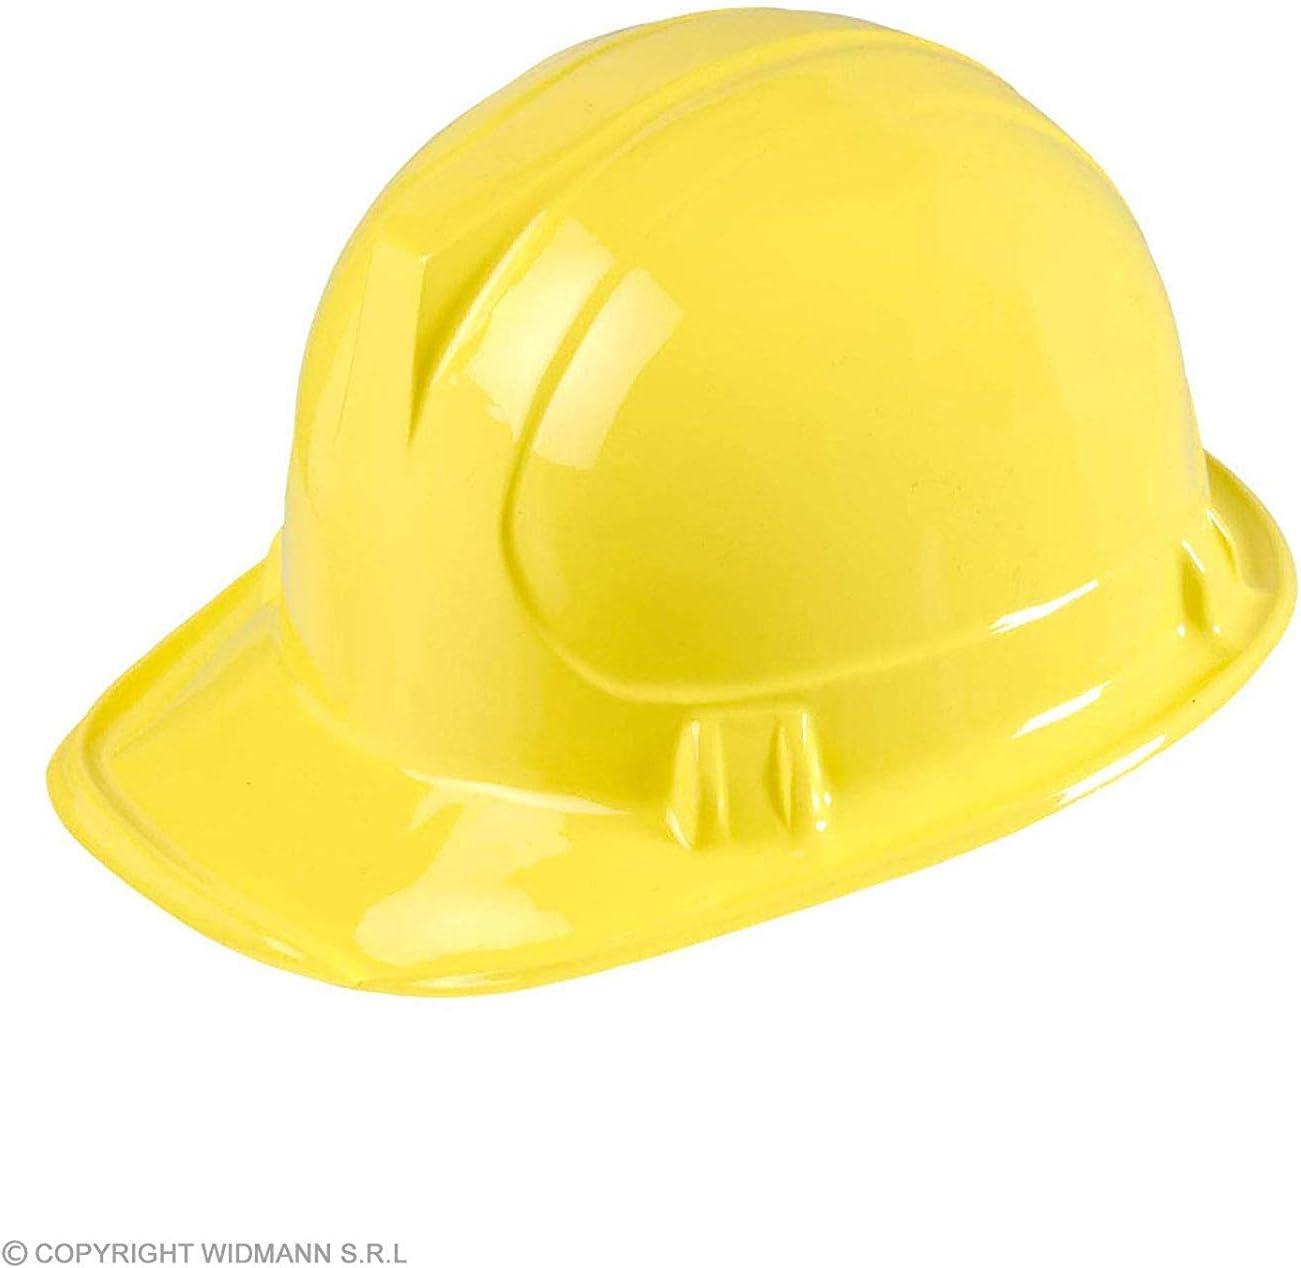 NEW Hat Builders Safety Helmet Soft Plastic Fancy Dress Multi Coloured B UK FAS